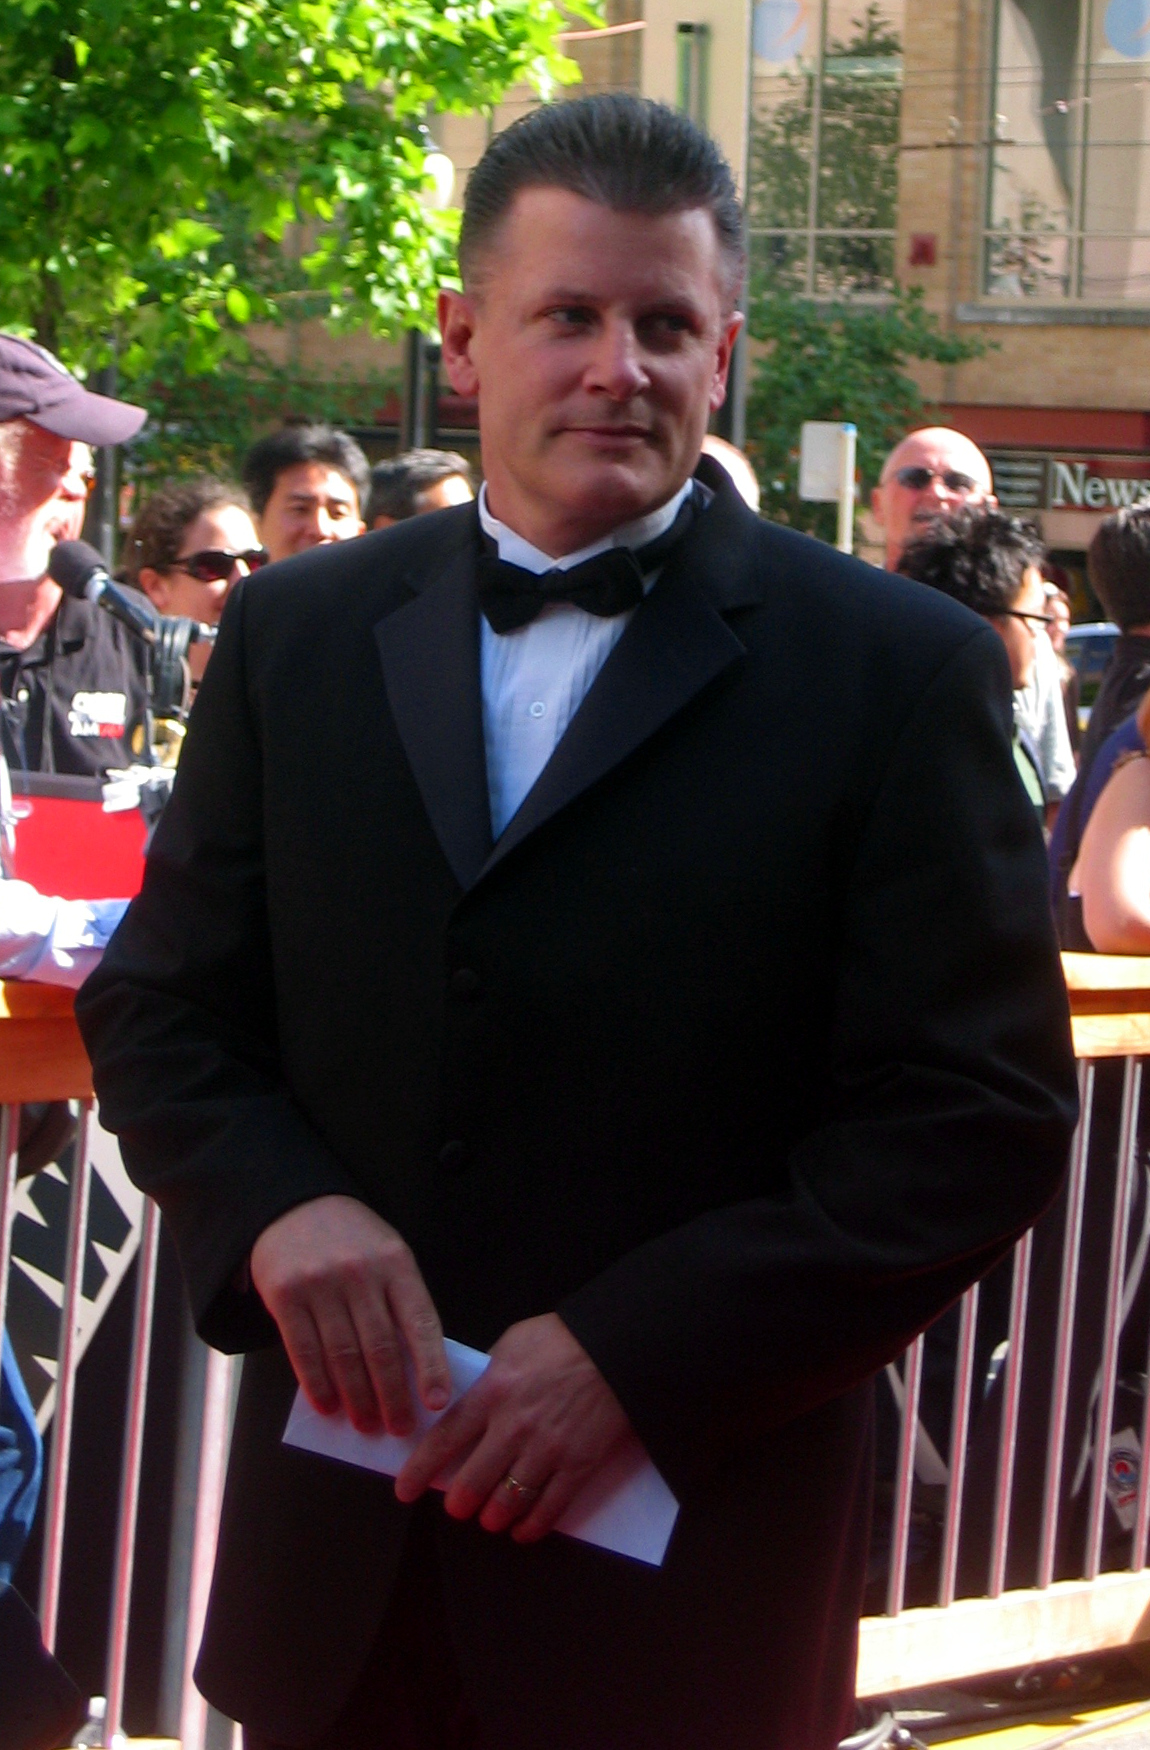 Arnold C photo, via Wikimedia Commons